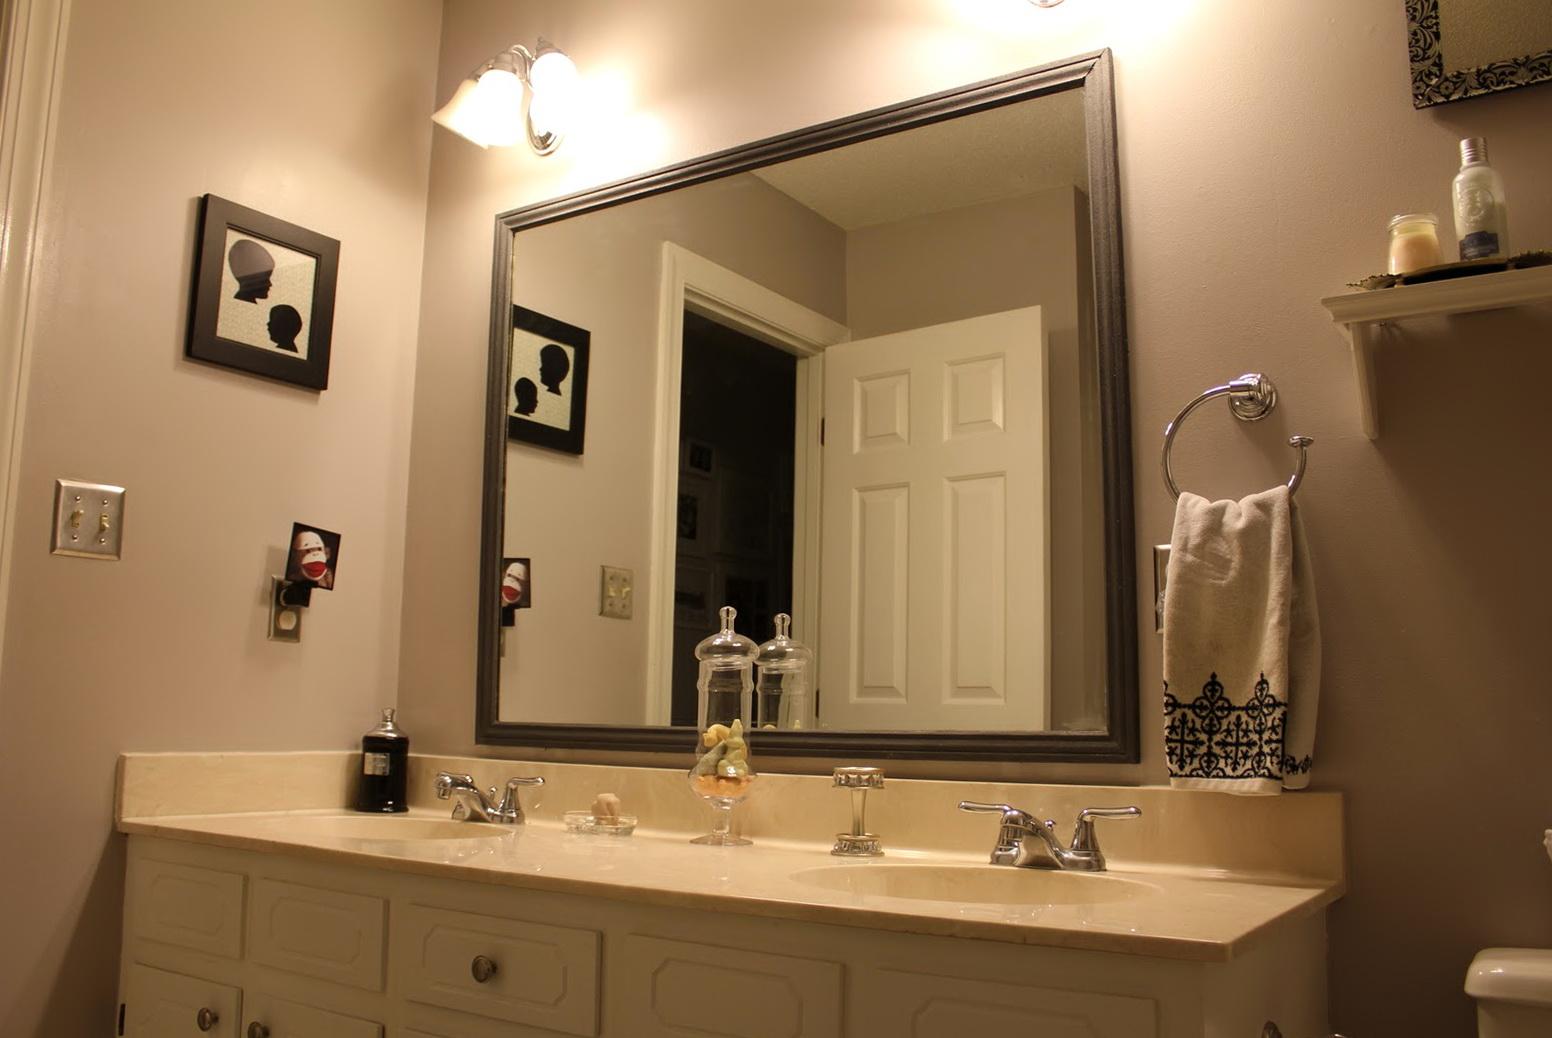 Ideas for framing a bathroom mirror home design ideas for A frame bathroom ideas